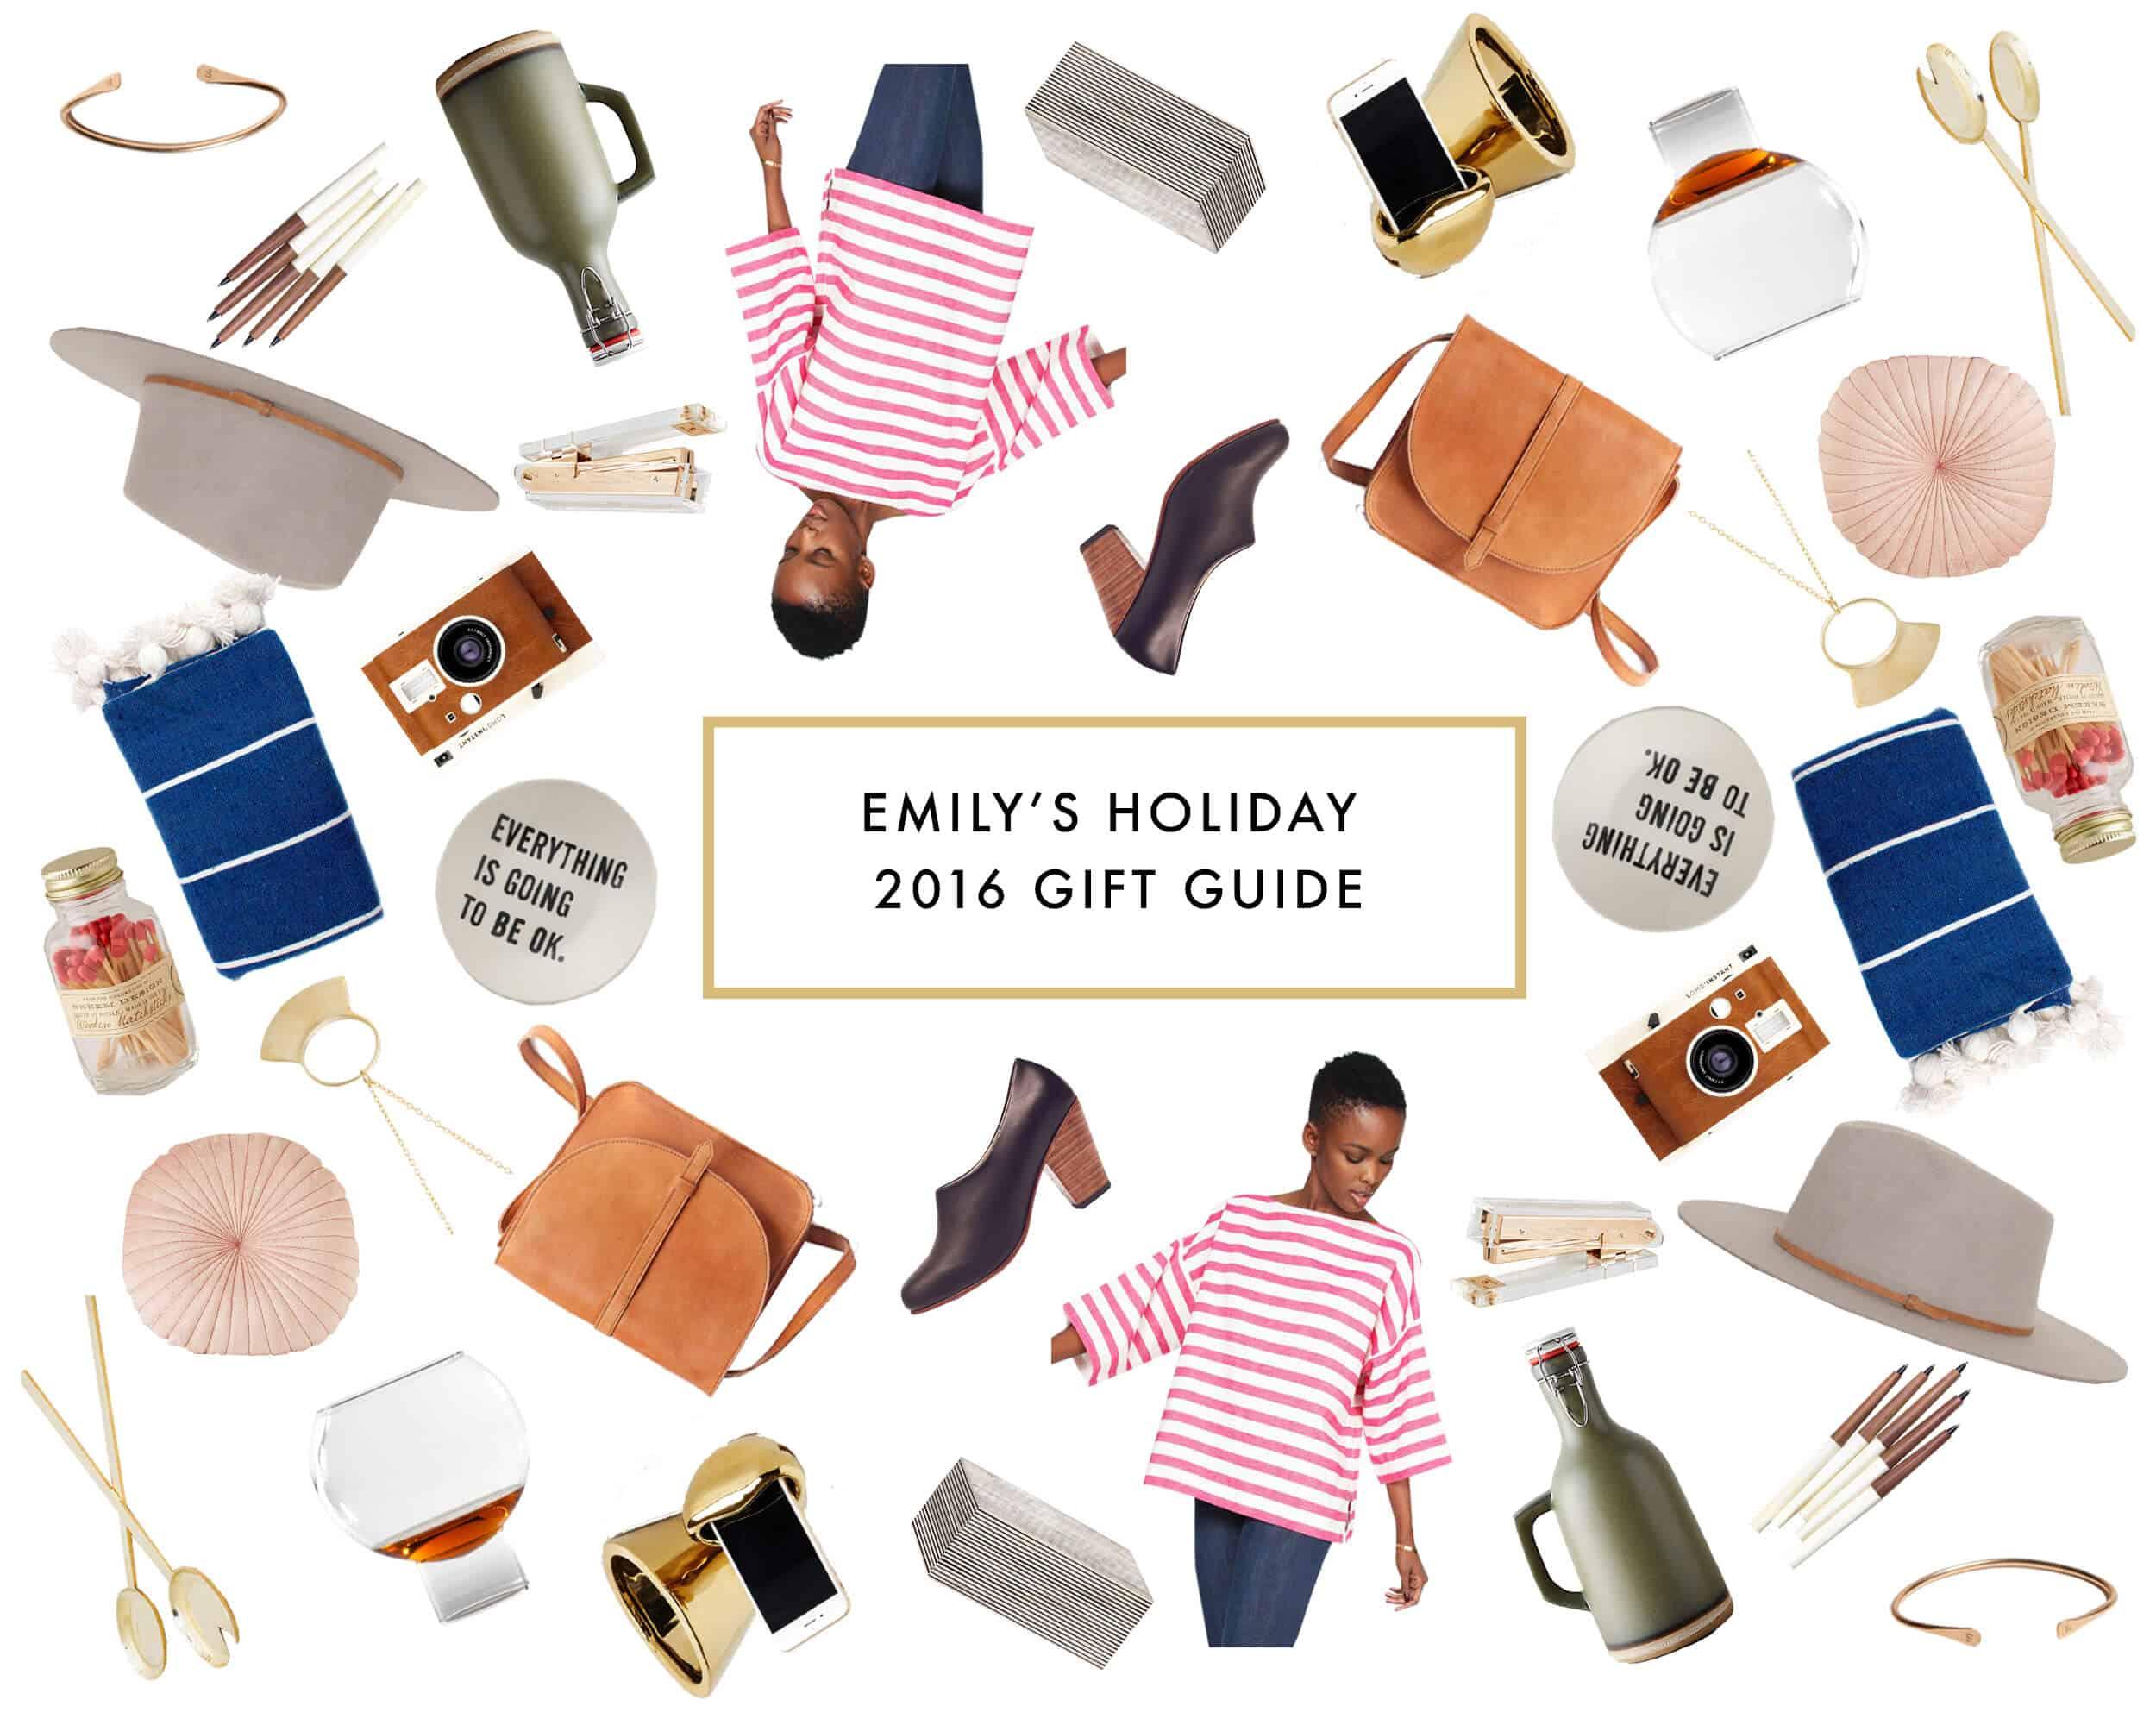 emilys holiday season